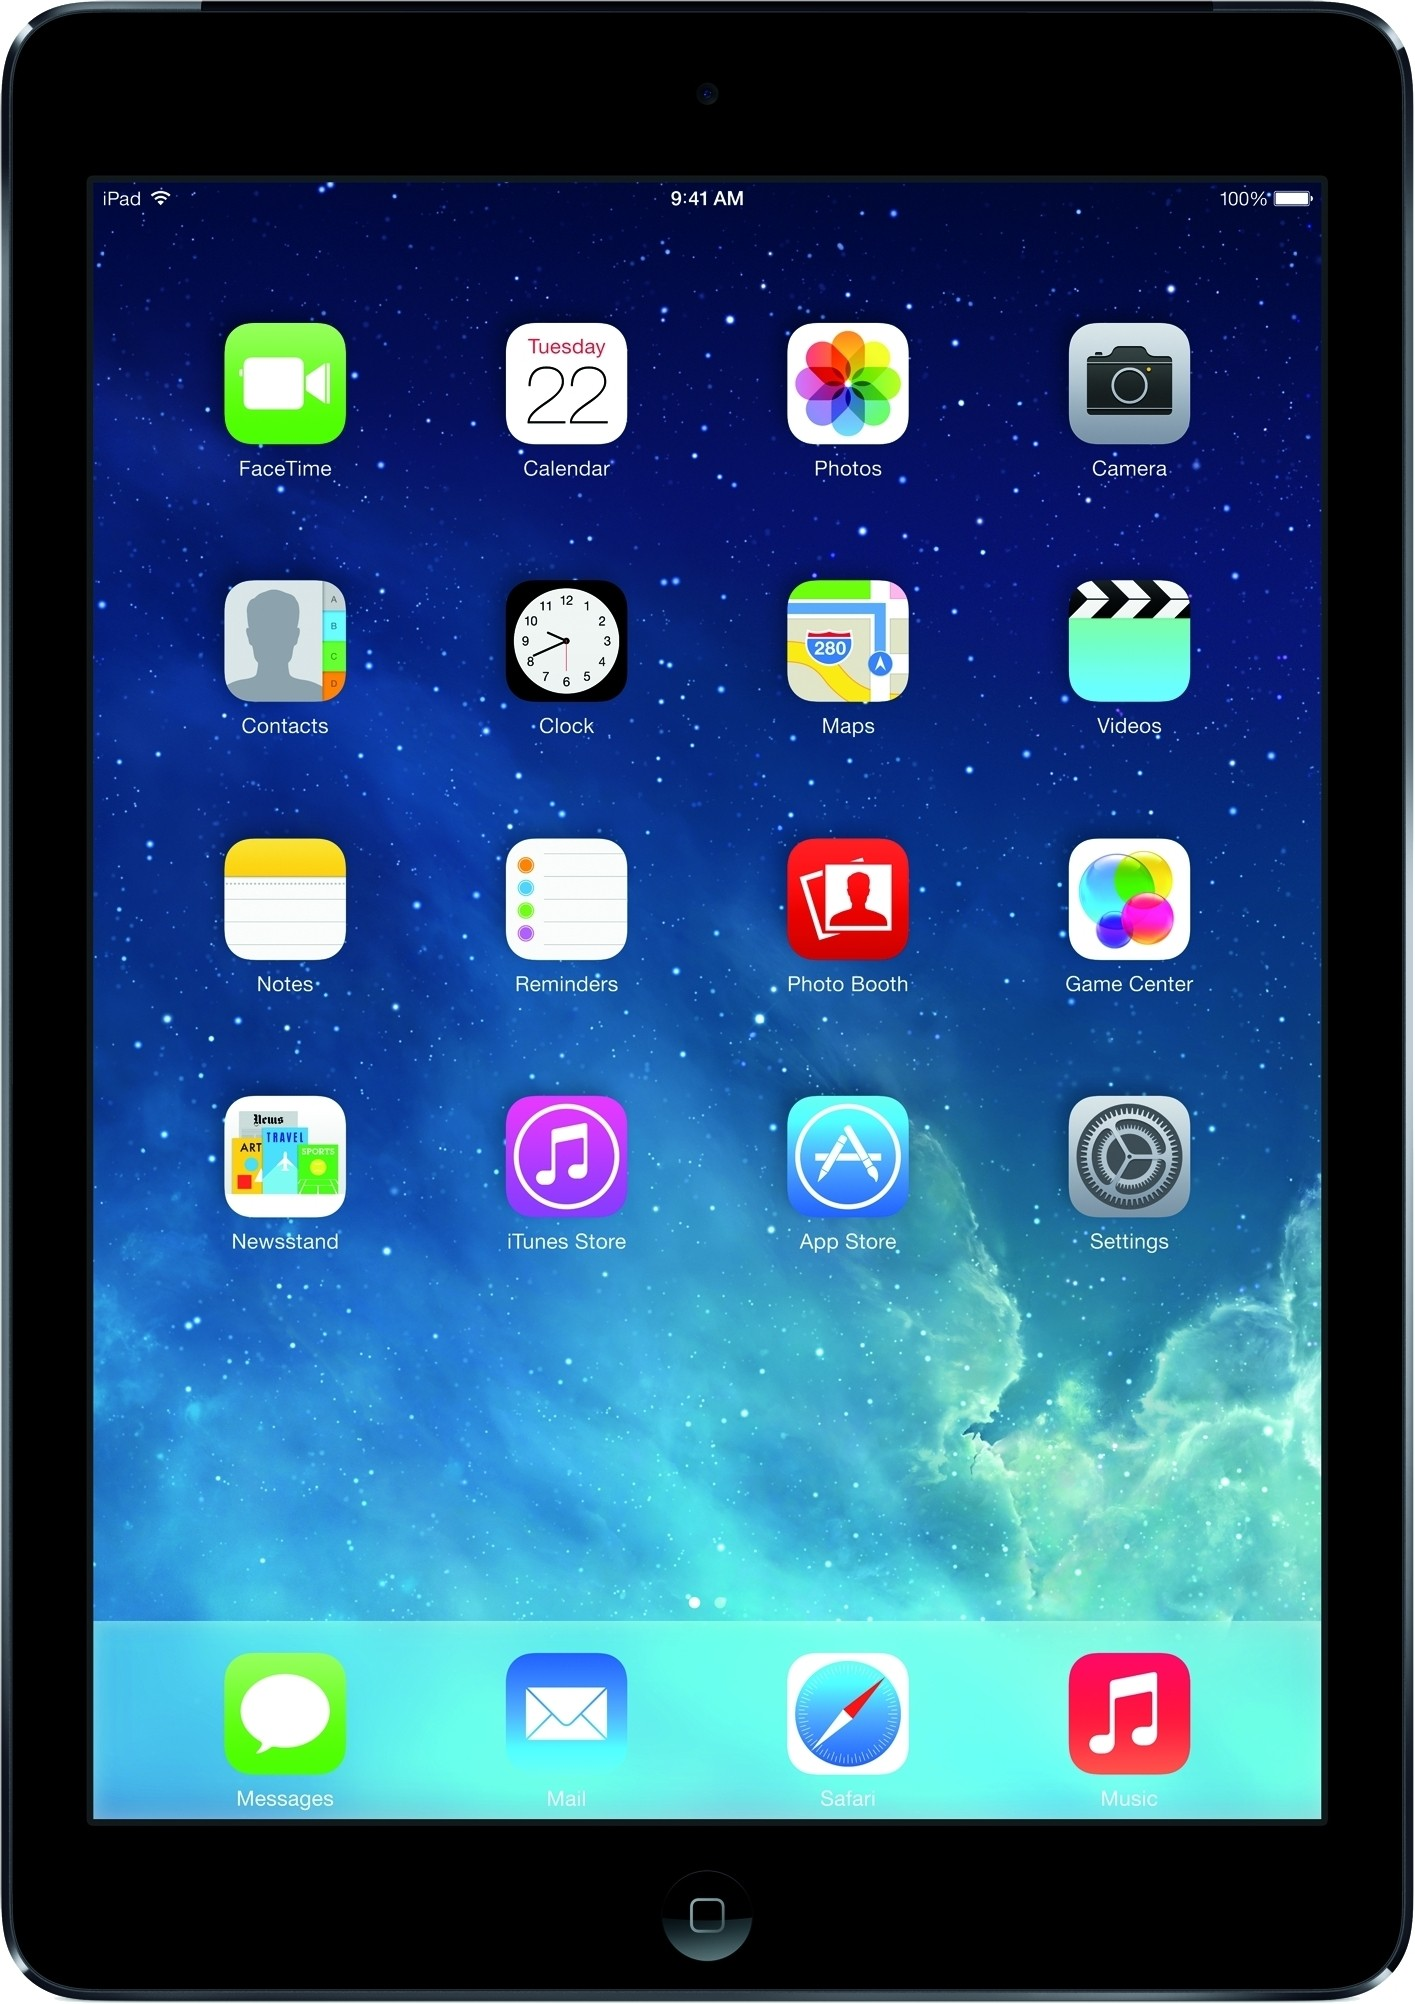 Apple 16 GB iPad Air with Wi-Fi + Cellular Space Grey, 16 GB, Wi-Fi, 3G